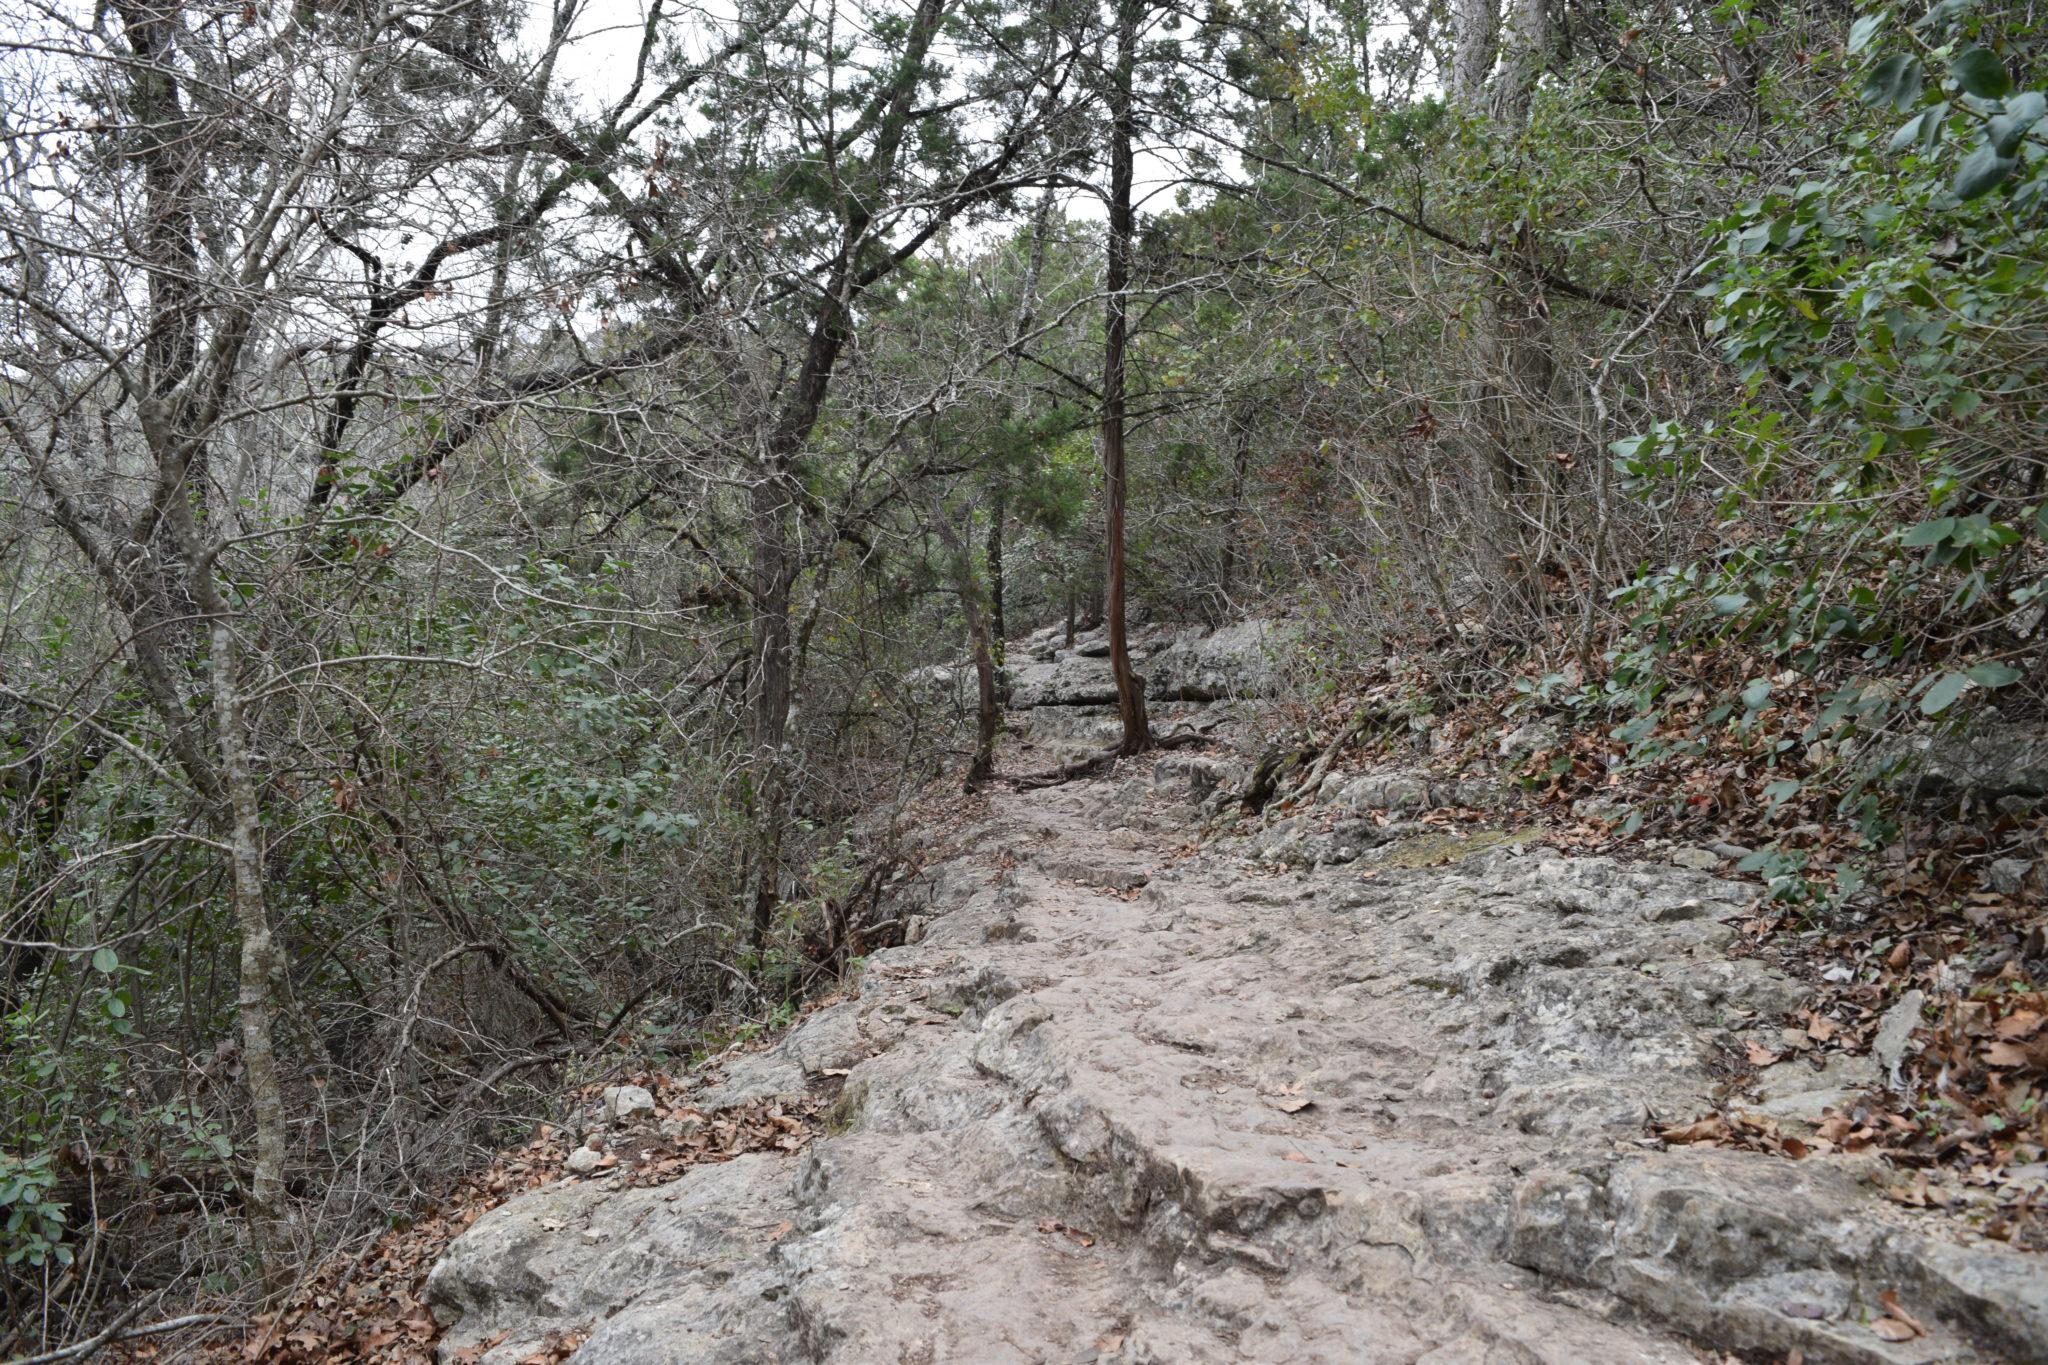 Part of the Vista Loop trail follows a limestone ledge at Friedrich Wilderness Park.